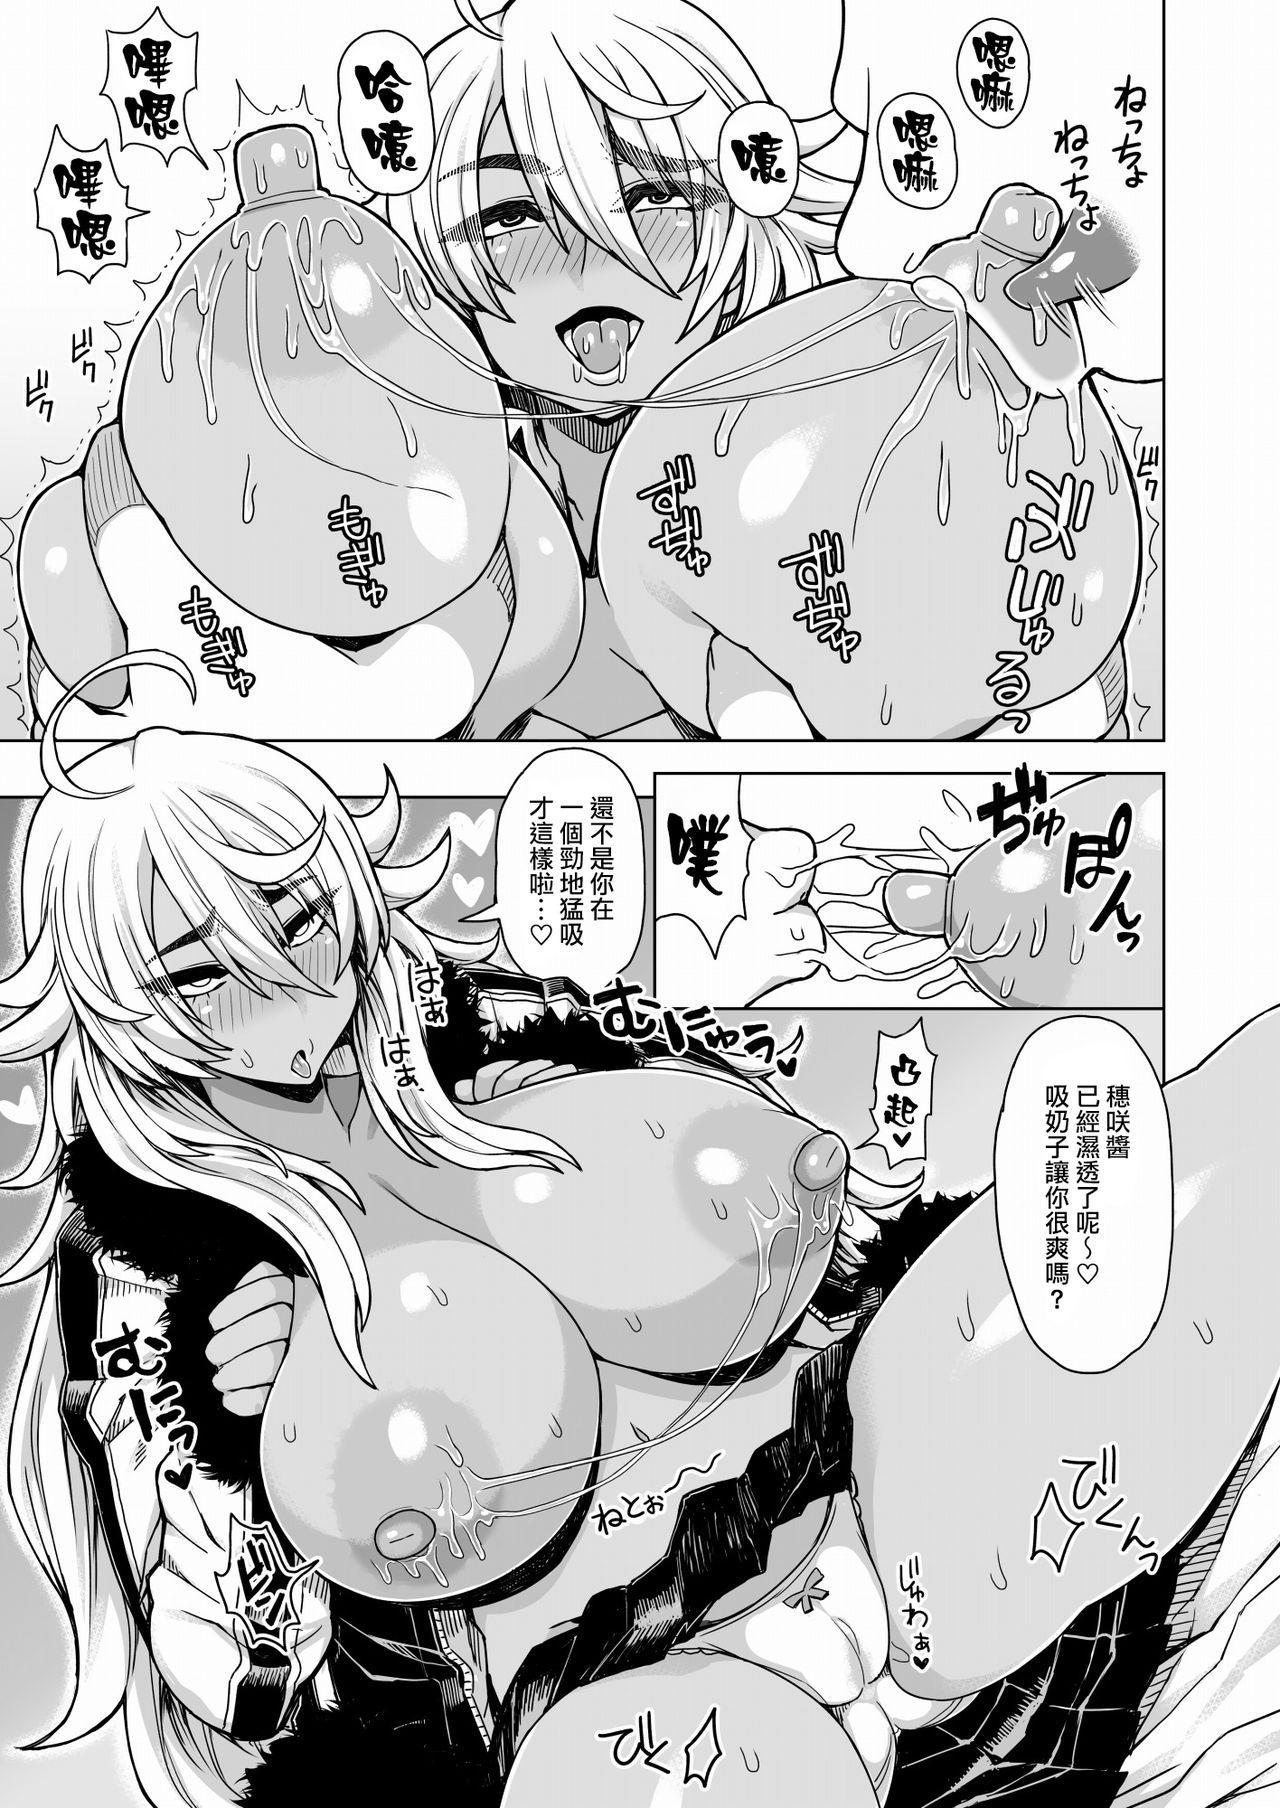 Futari no Kuro Gal Yankee | 兩個不良黑皮辣妹 7